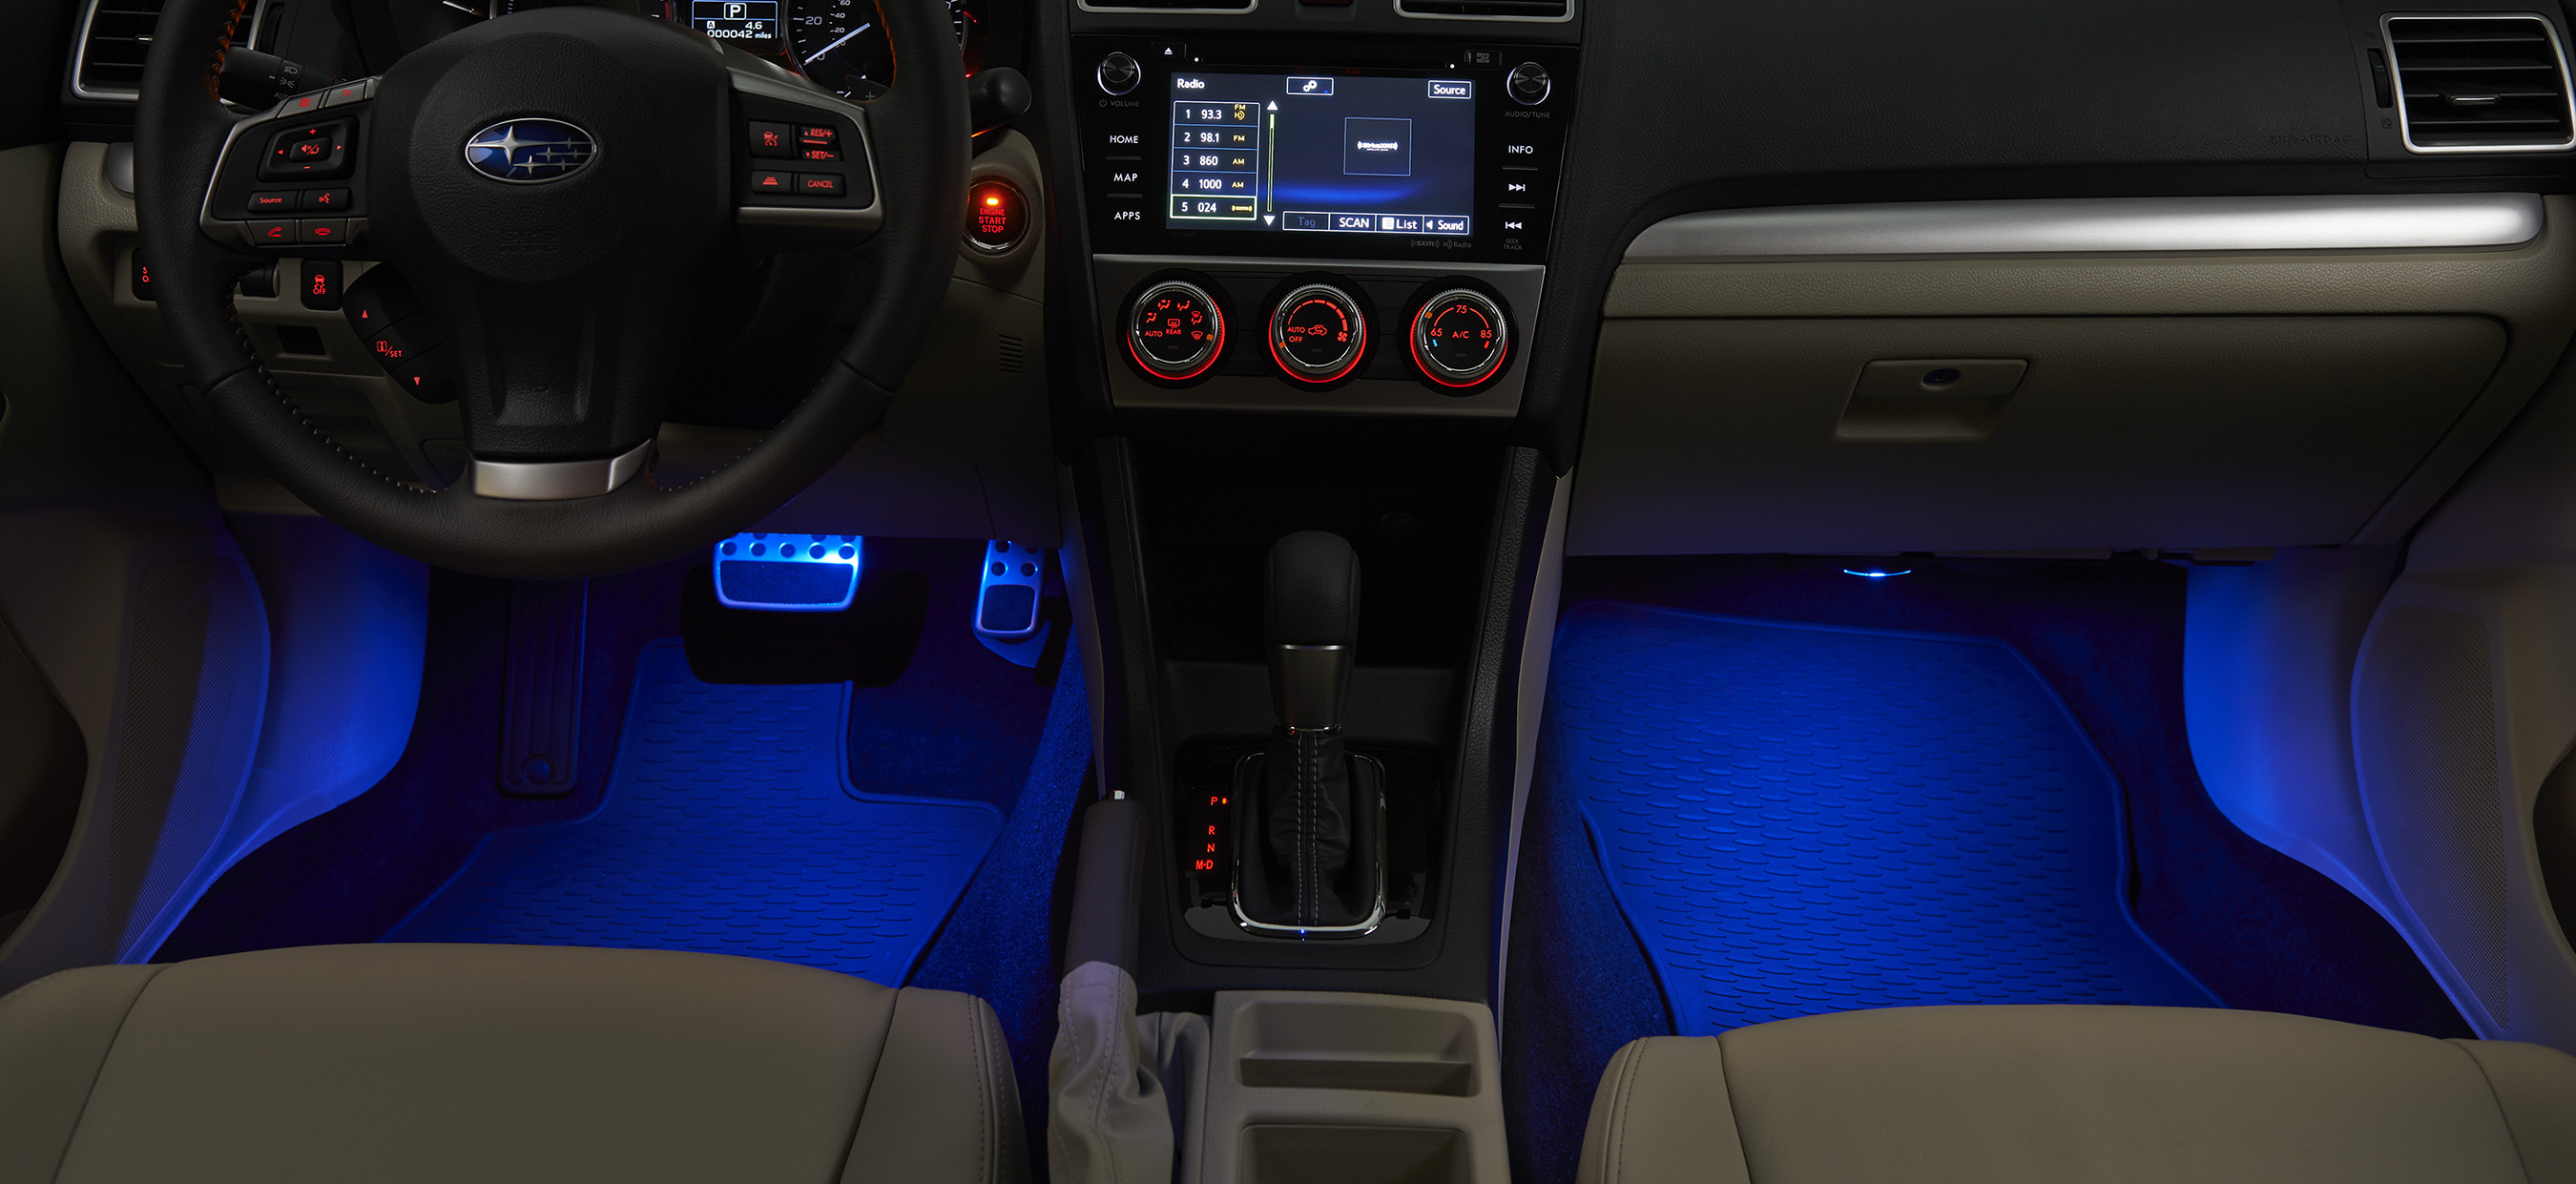 2014 Subaru Impreza Interior Illumination Kit Blue H701sfj001 Subaru Las Vegas Nv